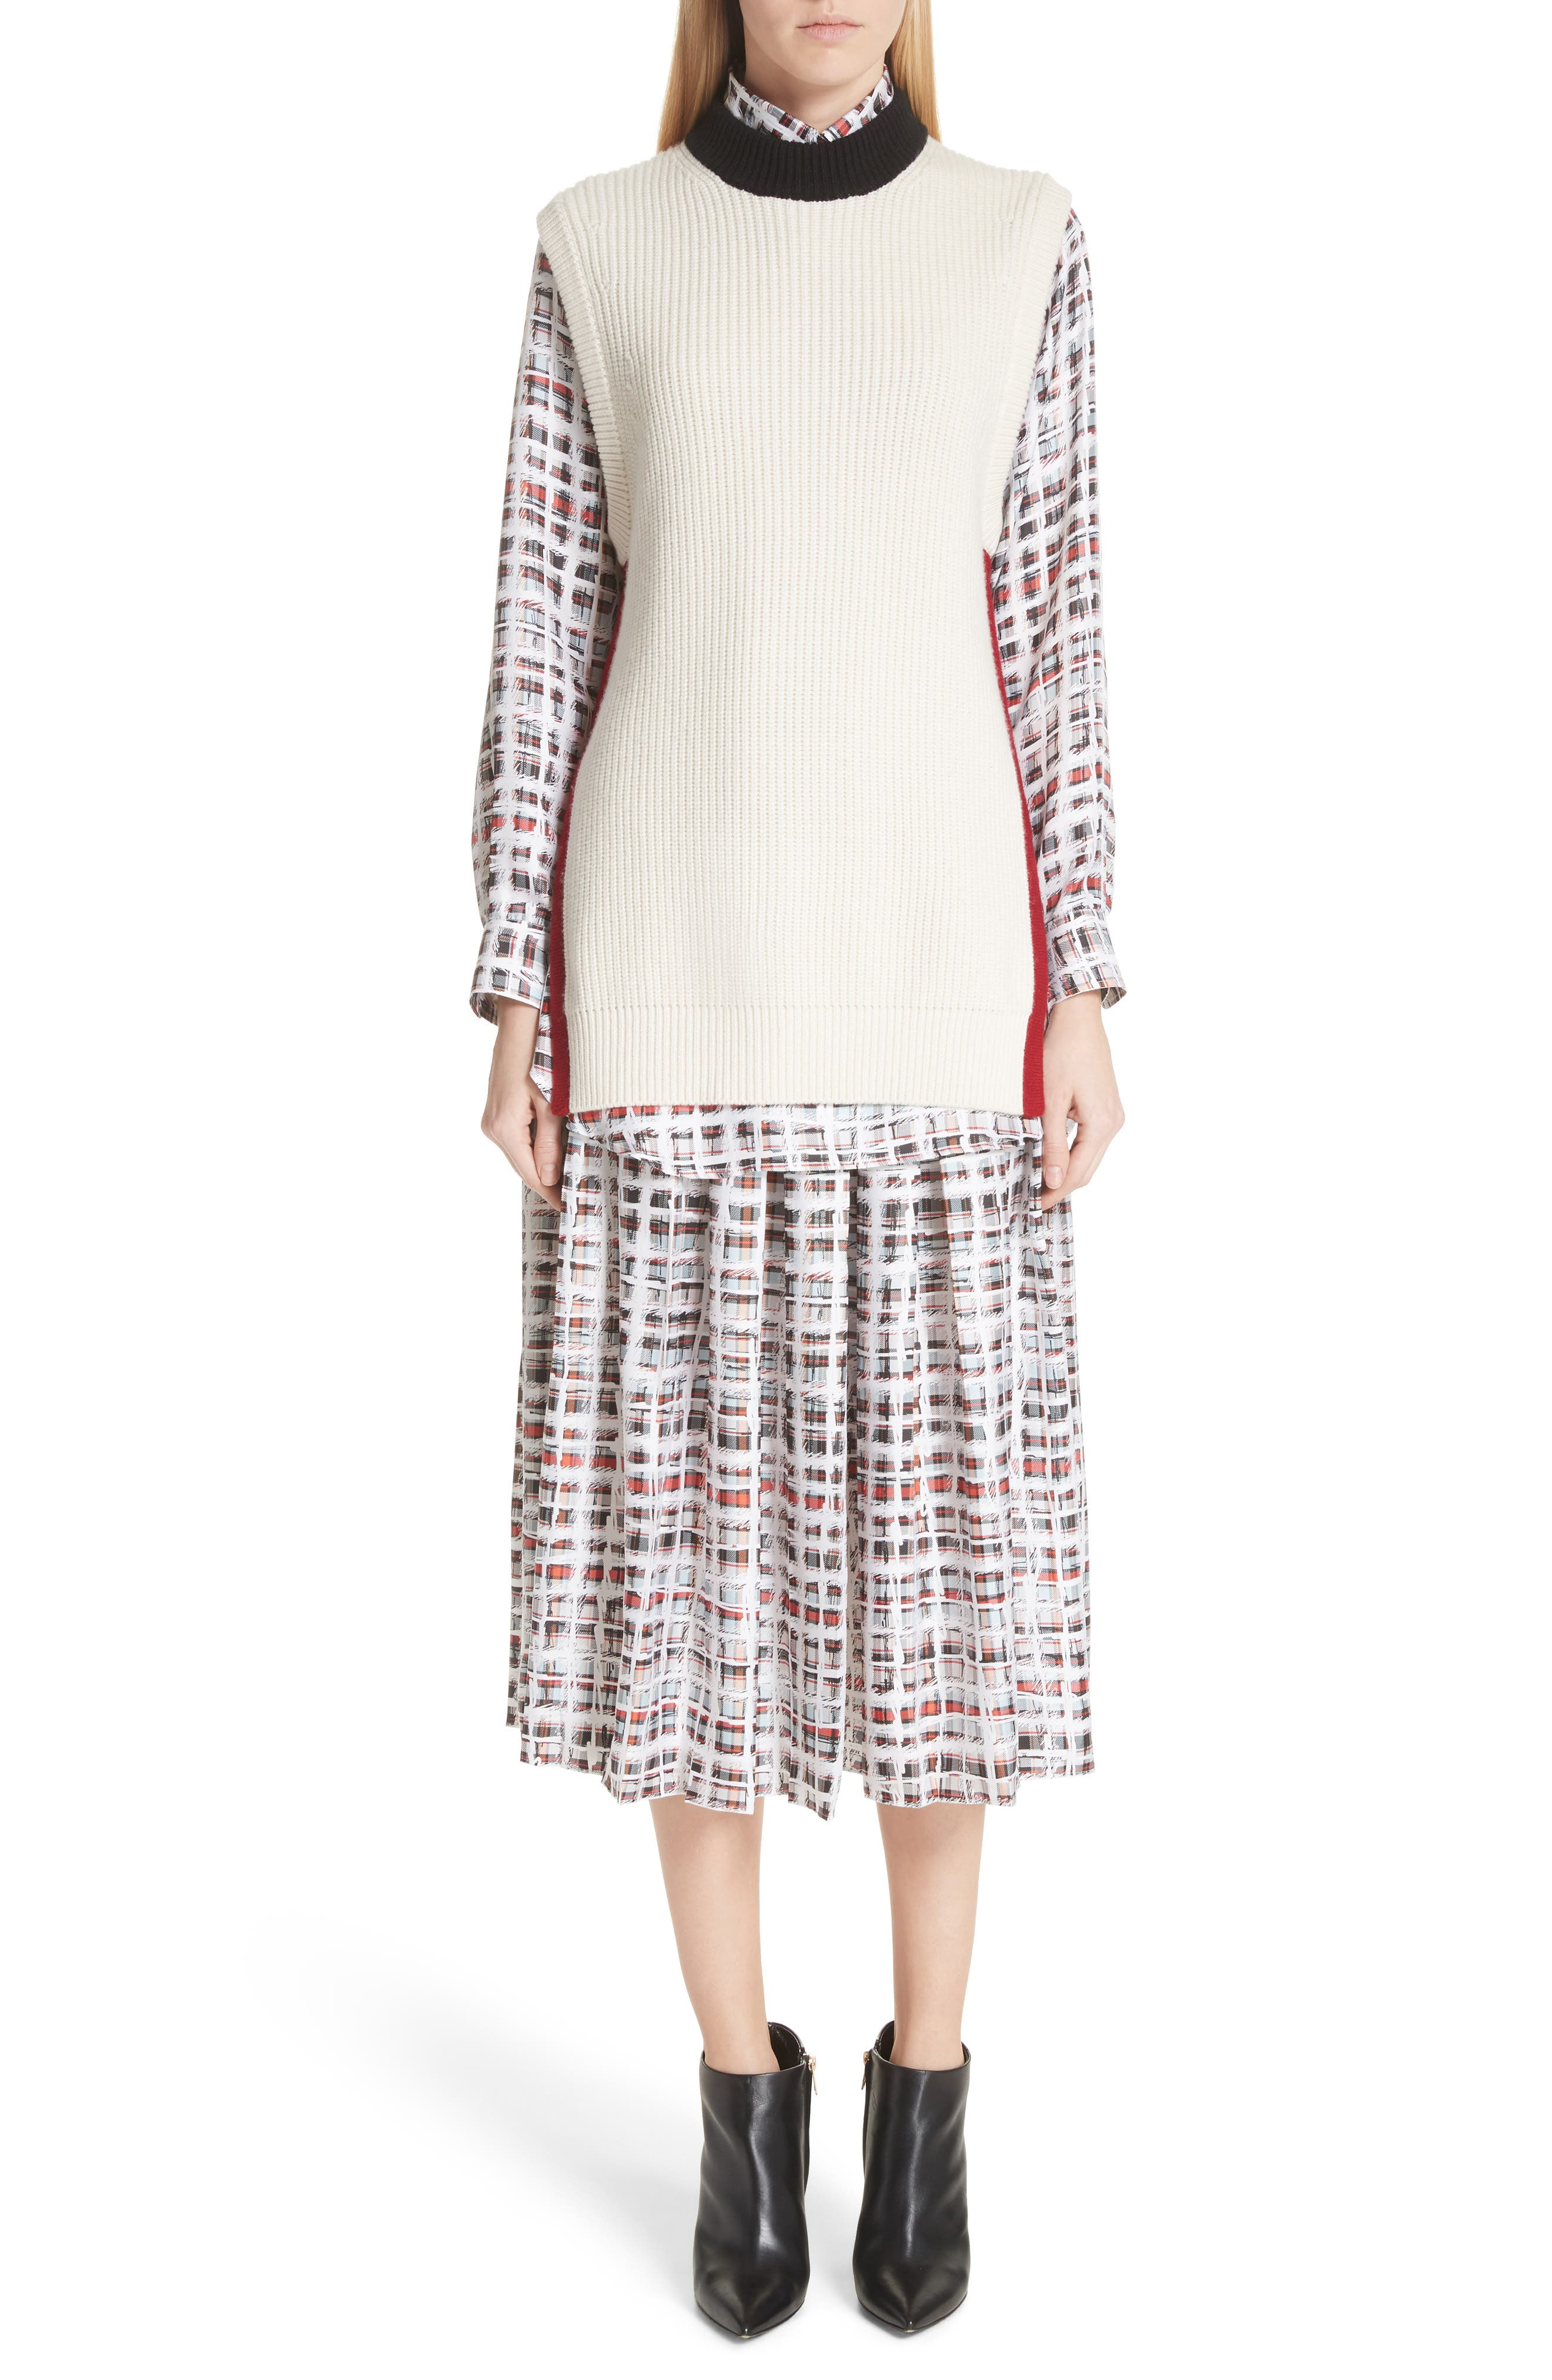 BURBERRY, Farnborough Pleated Check Silk Midi Skirt, Main thumbnail 1, color, CADMIUM RED